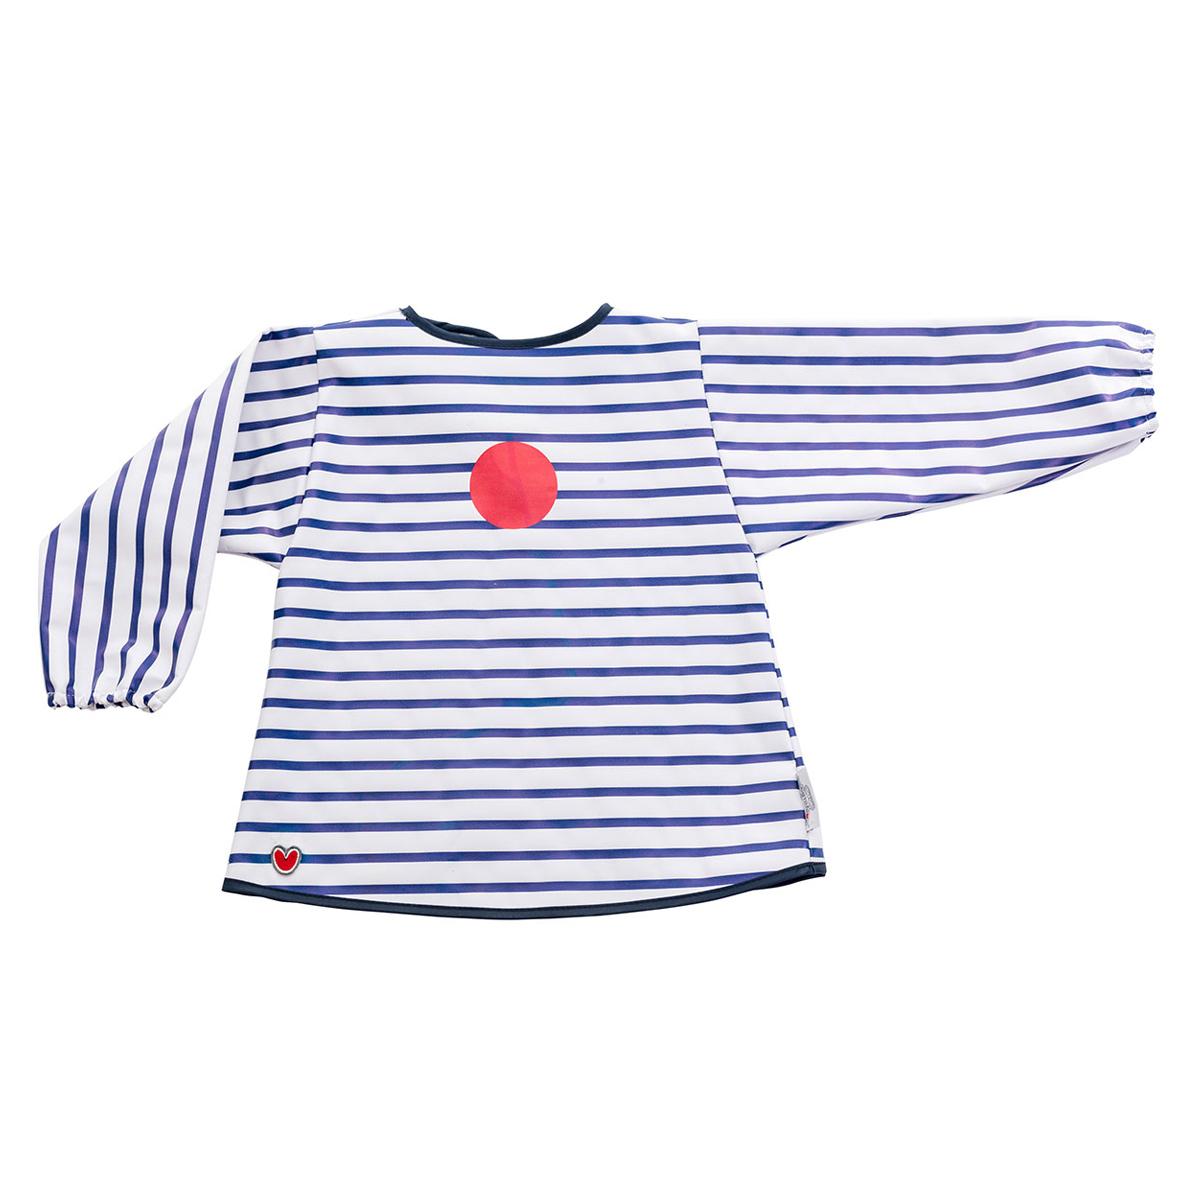 Bavoir Tablier Bavoir - Blue Stripes Tablier Bavoir - Blue Stripes